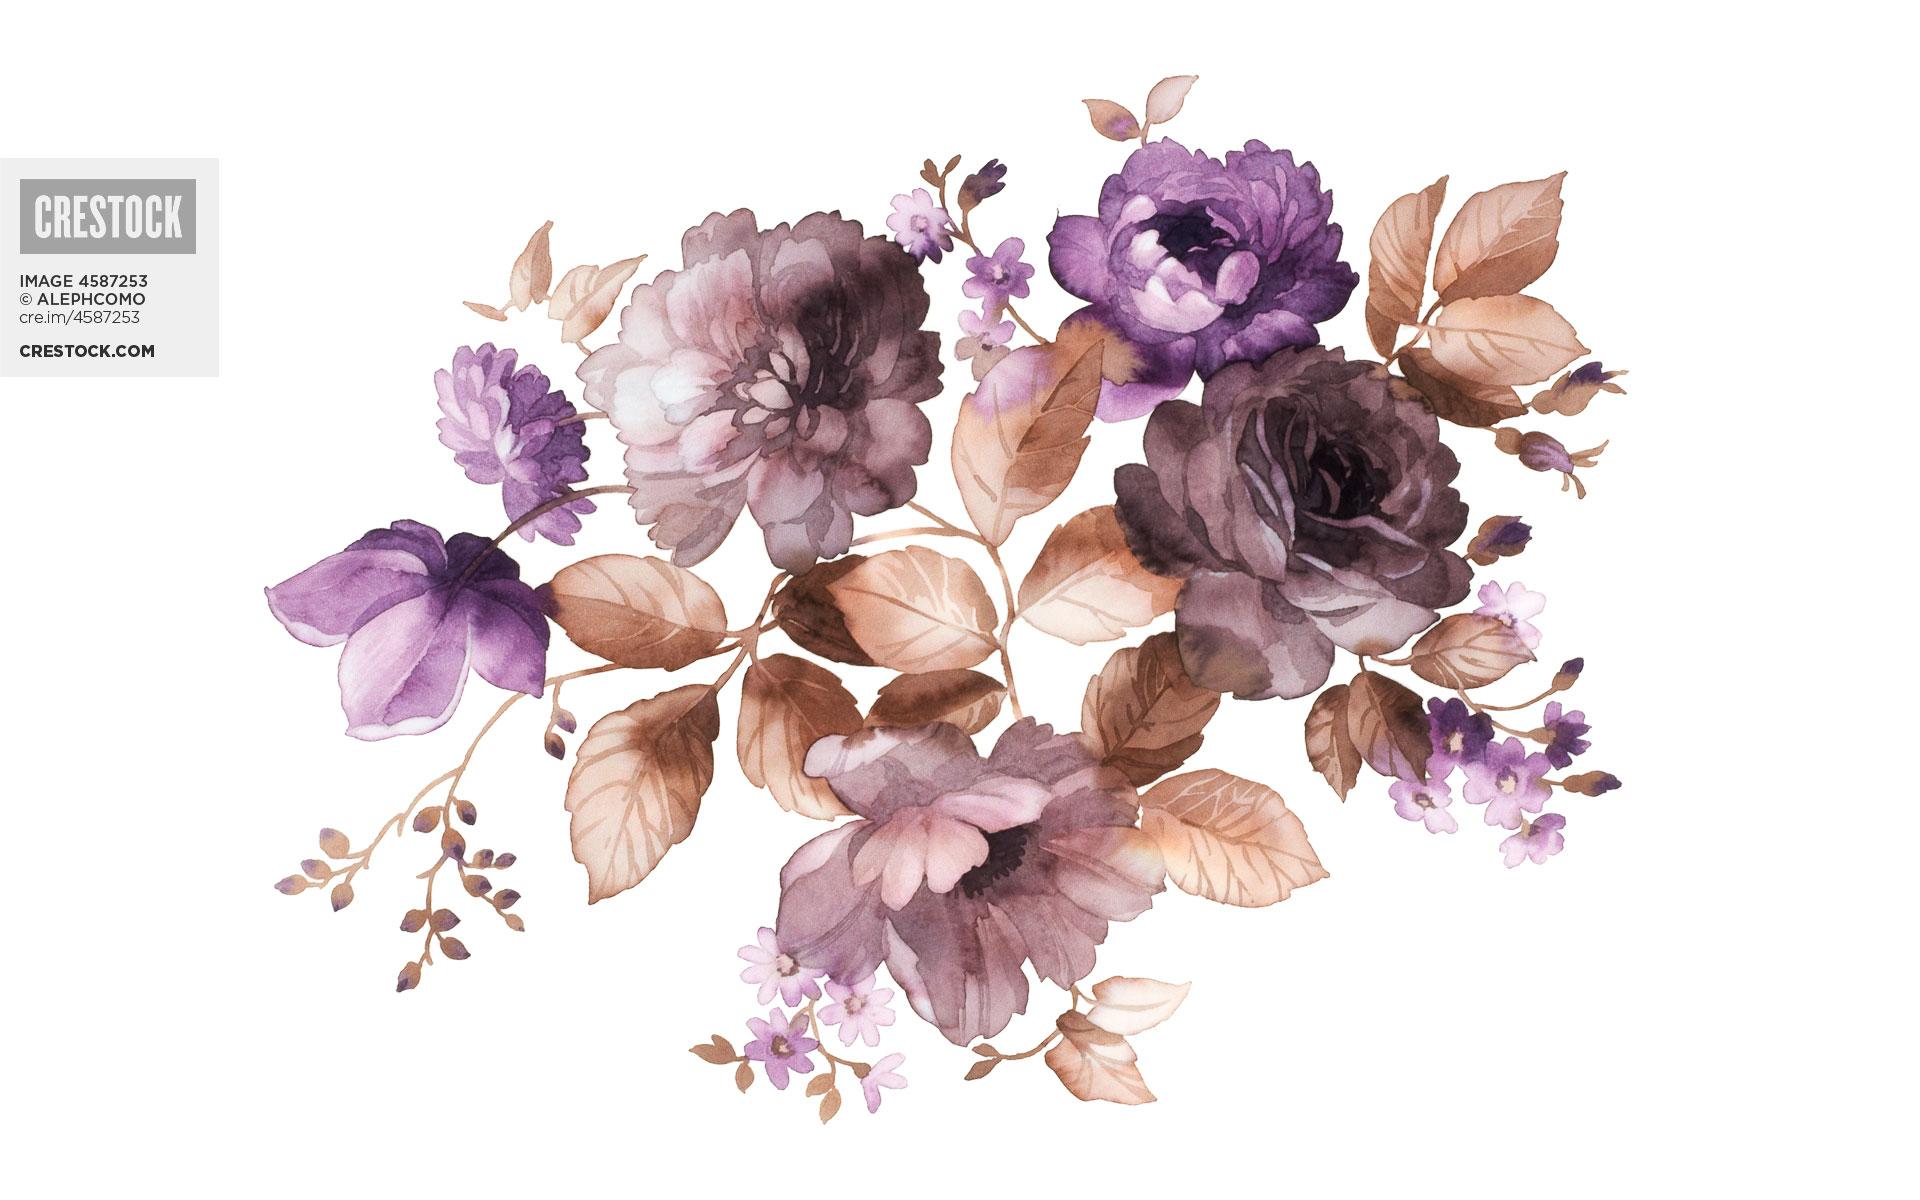 Most Inspiring Wallpaper Home Screen Watercolor - Crestock-4587253-1920x1200  Image_719624.jpg